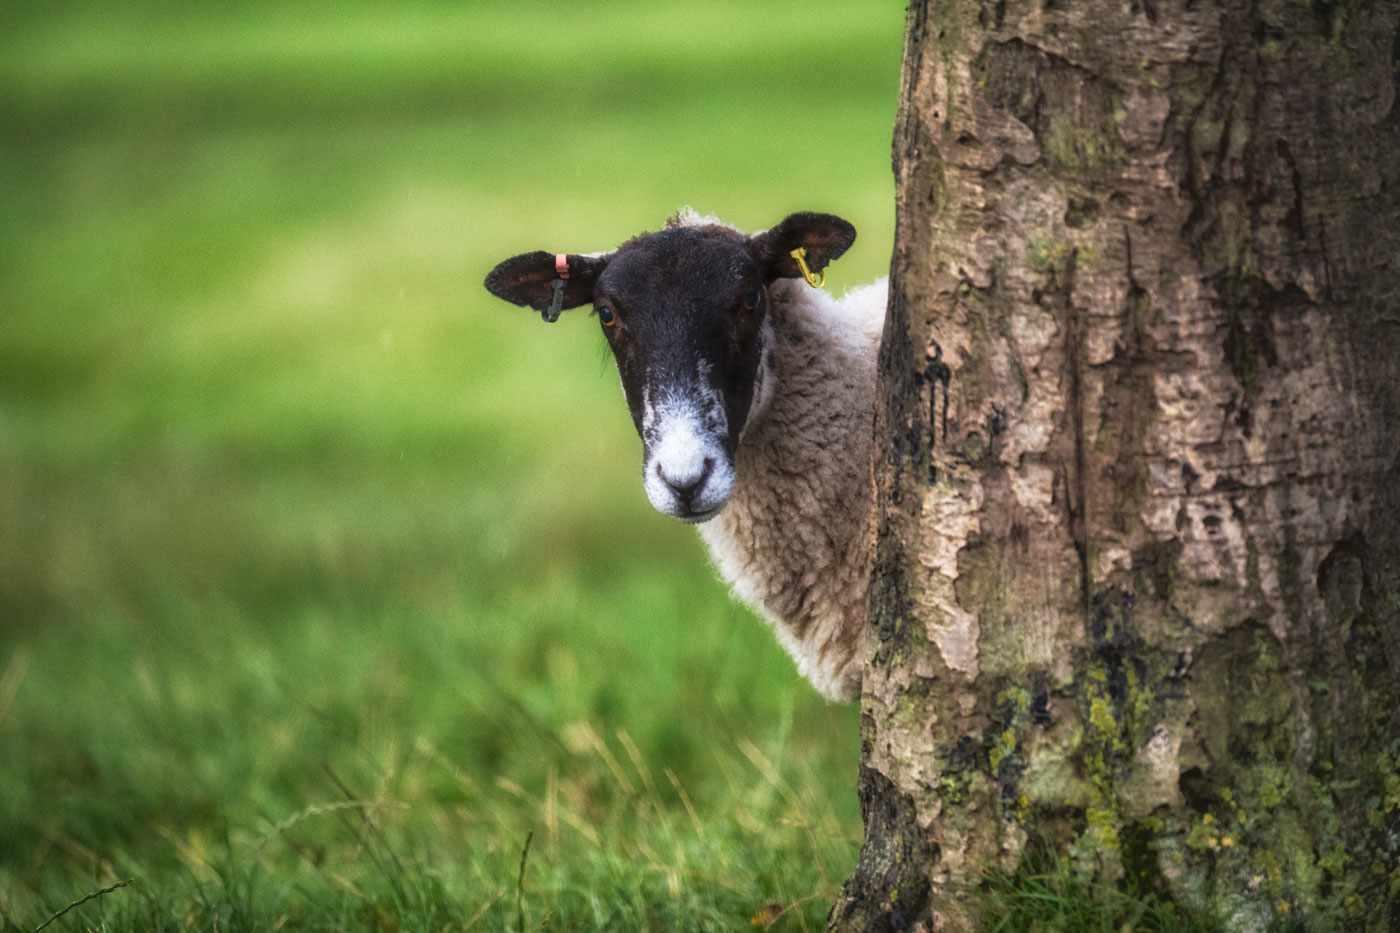 Sheeppeeping-c814369